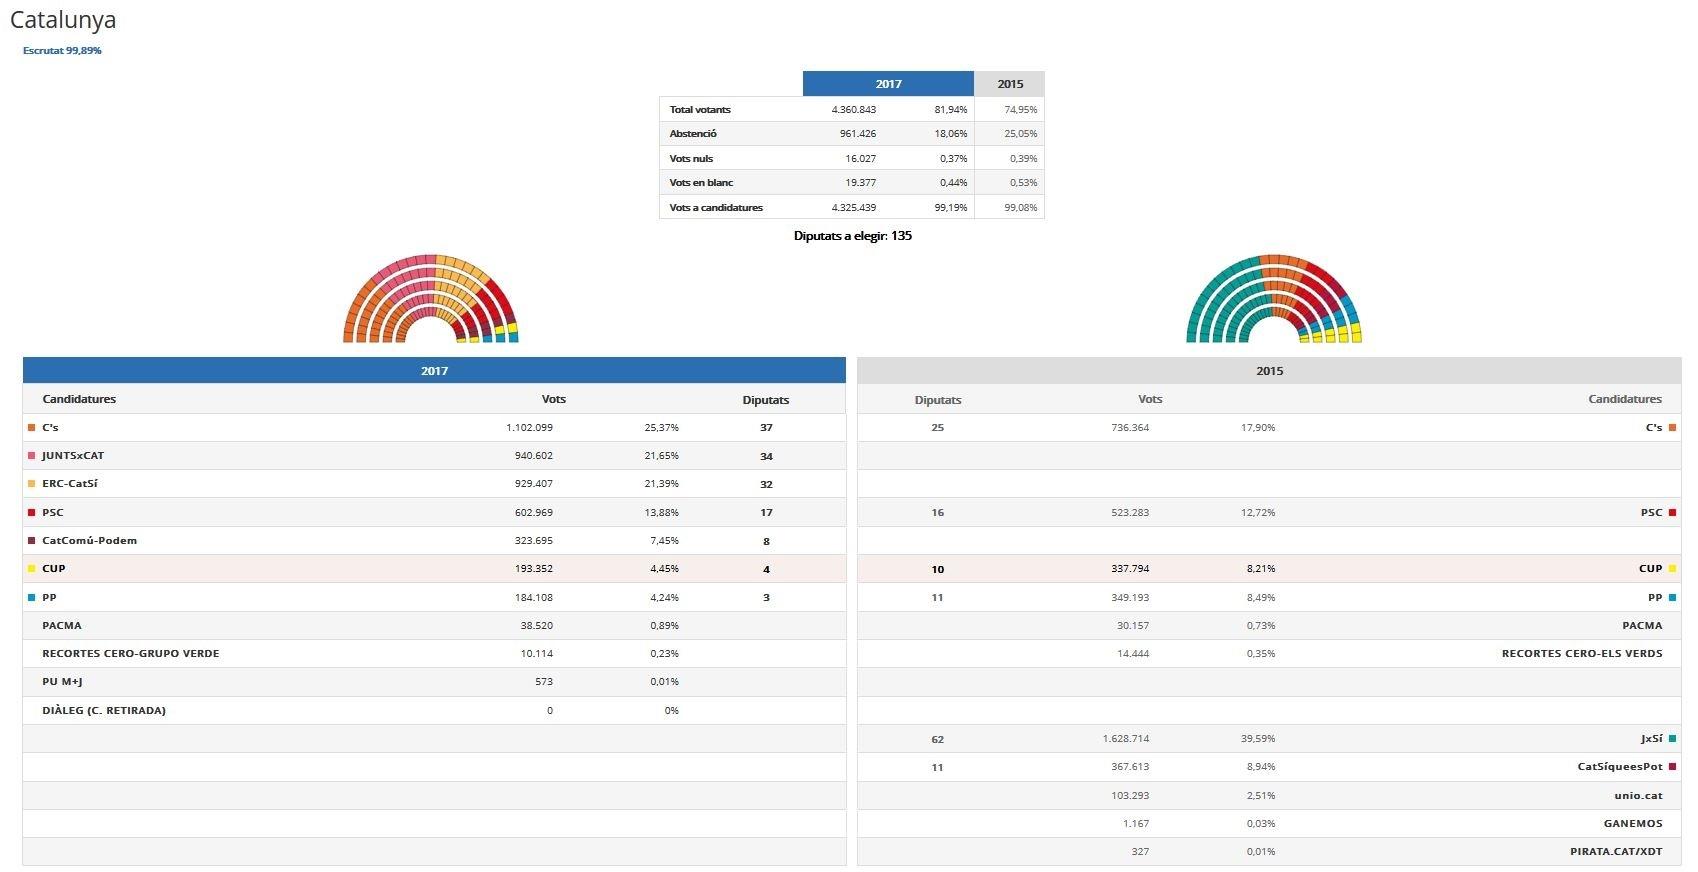 Catalan election data